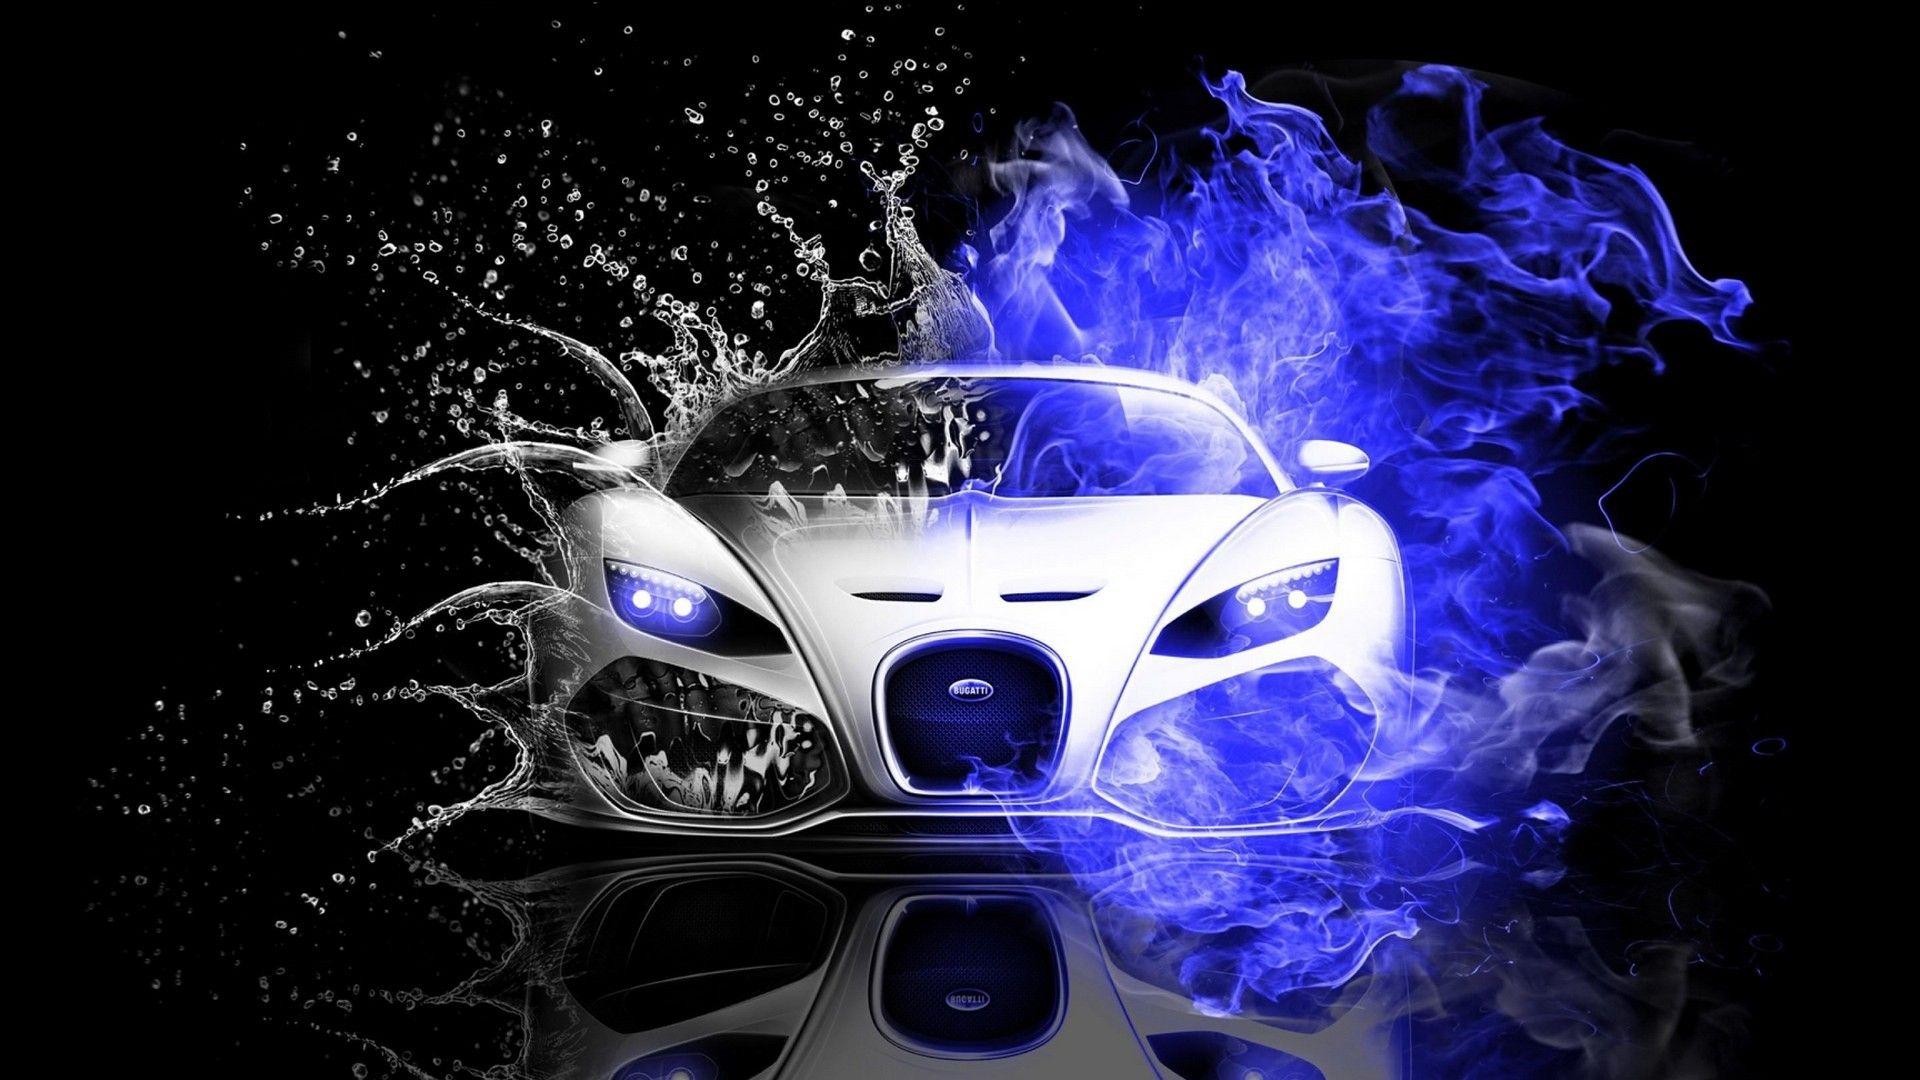 Sport Car Hd Backgrounds 2021 Live Wallpaper Hd Bugatti Car Wallpapers Hd Wallpaper